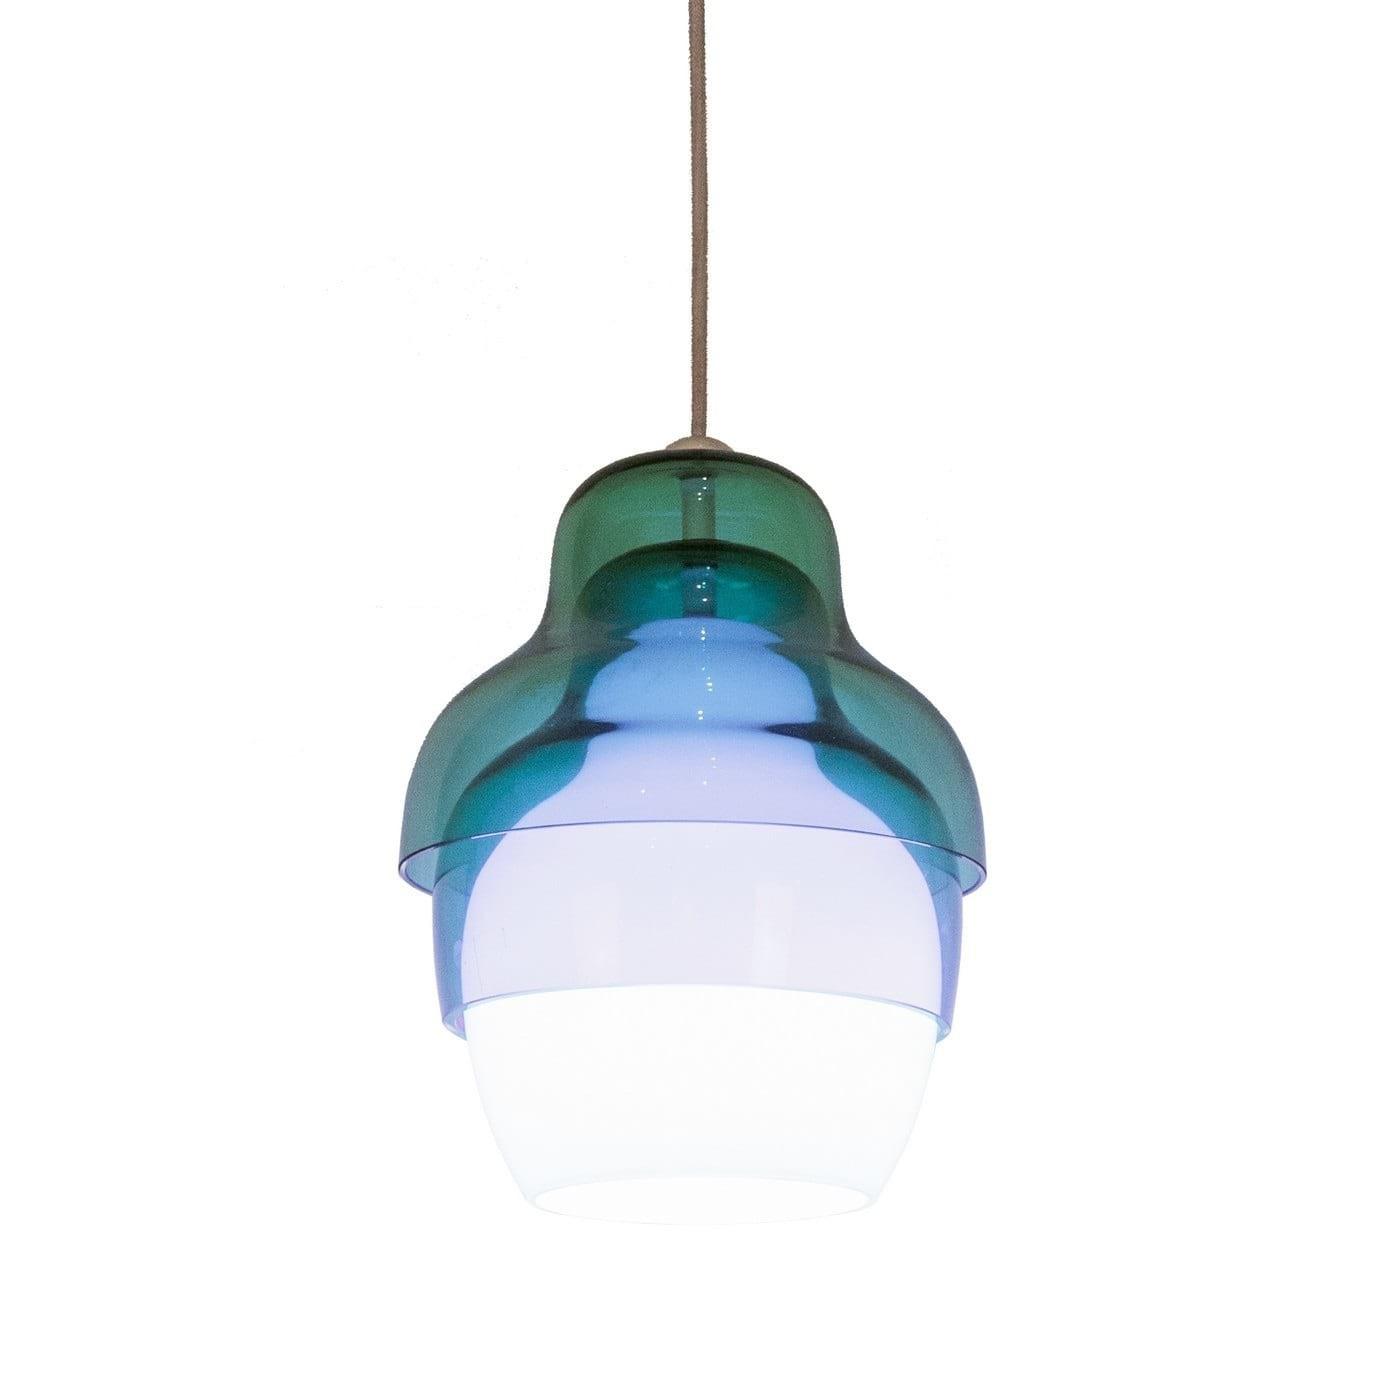 matrioshka pendant lamp